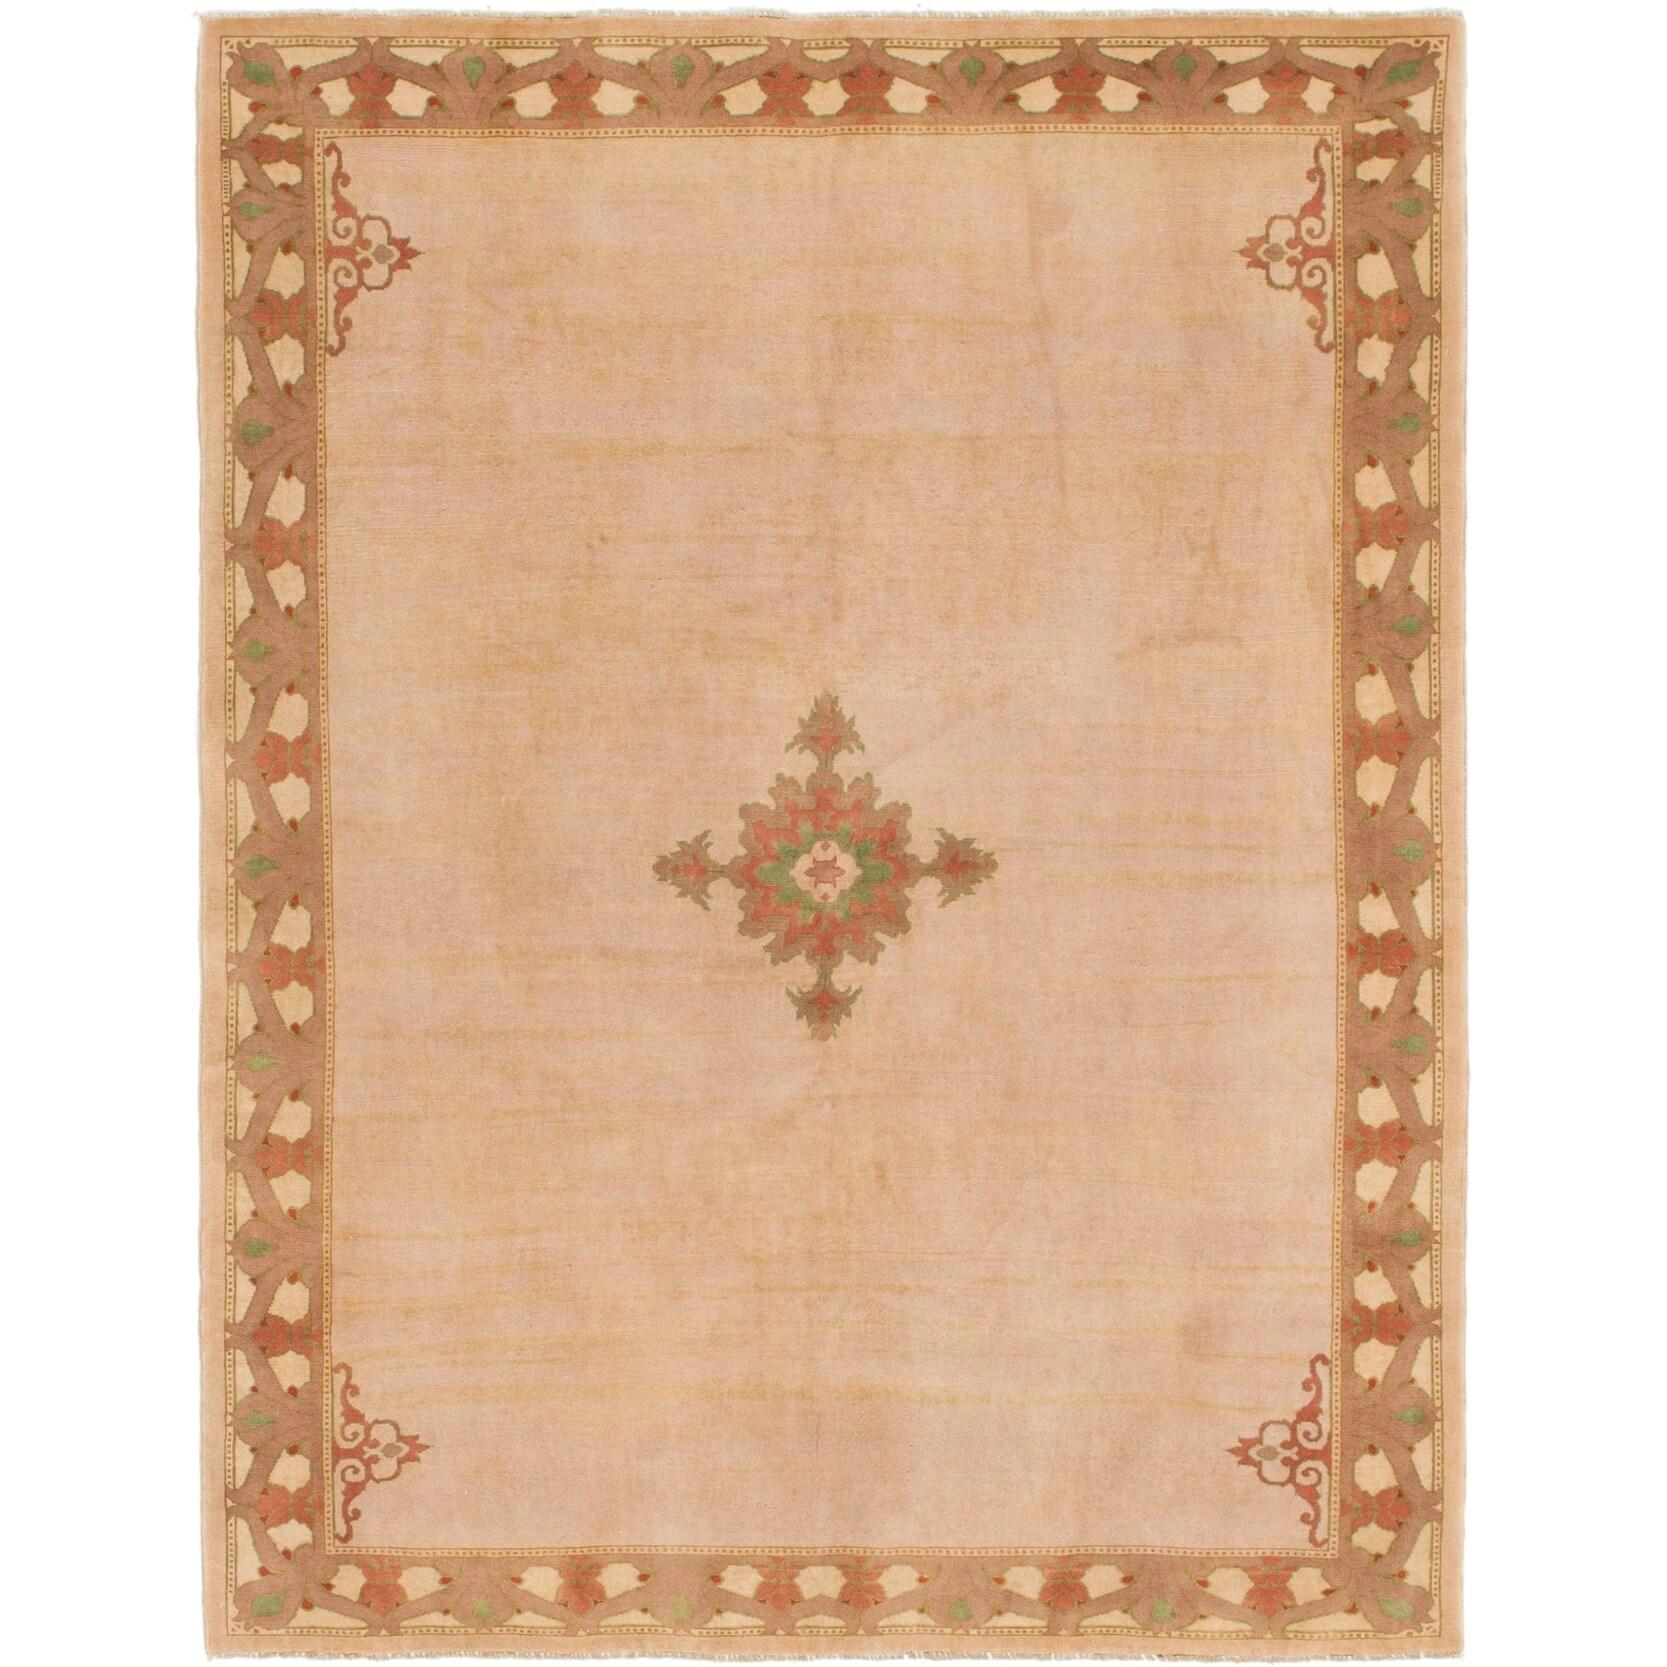 Hand Knotted Kashkuli Gabbeh Wool Area Rug - 4 9 x 6 2 (peach - 4 9 x 6 2)